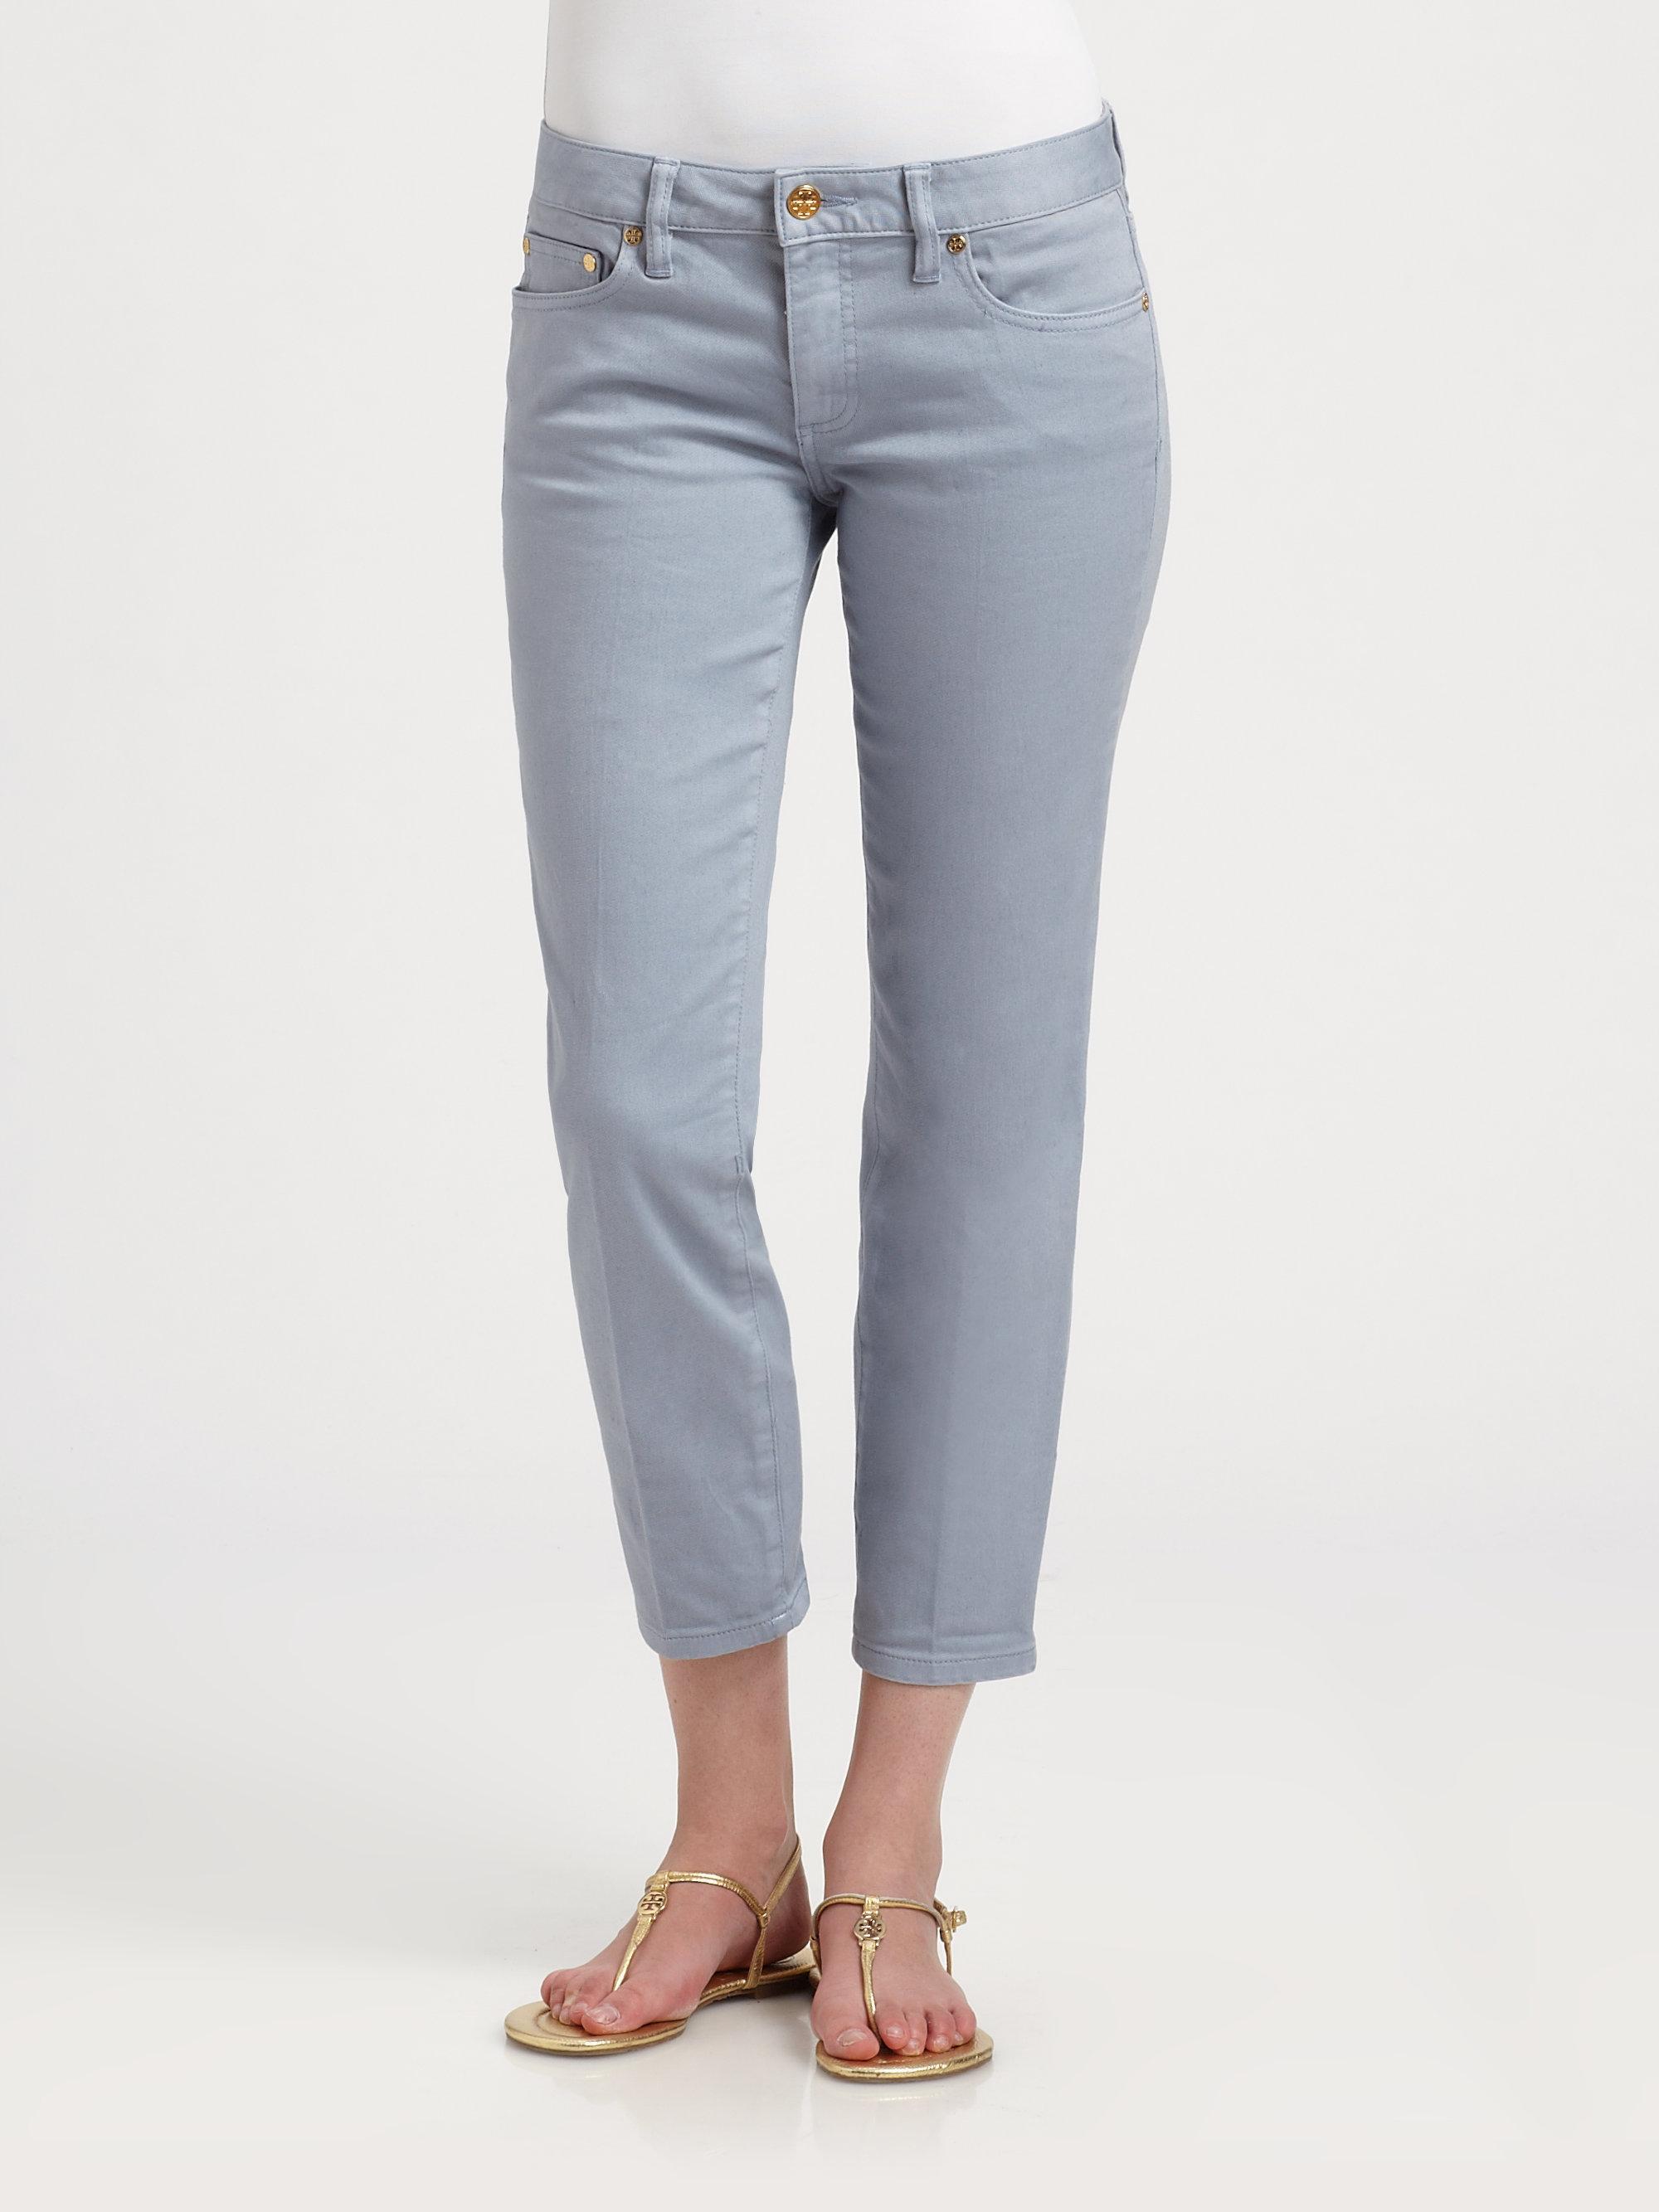 Tory burch alexa cropped skinny jeans